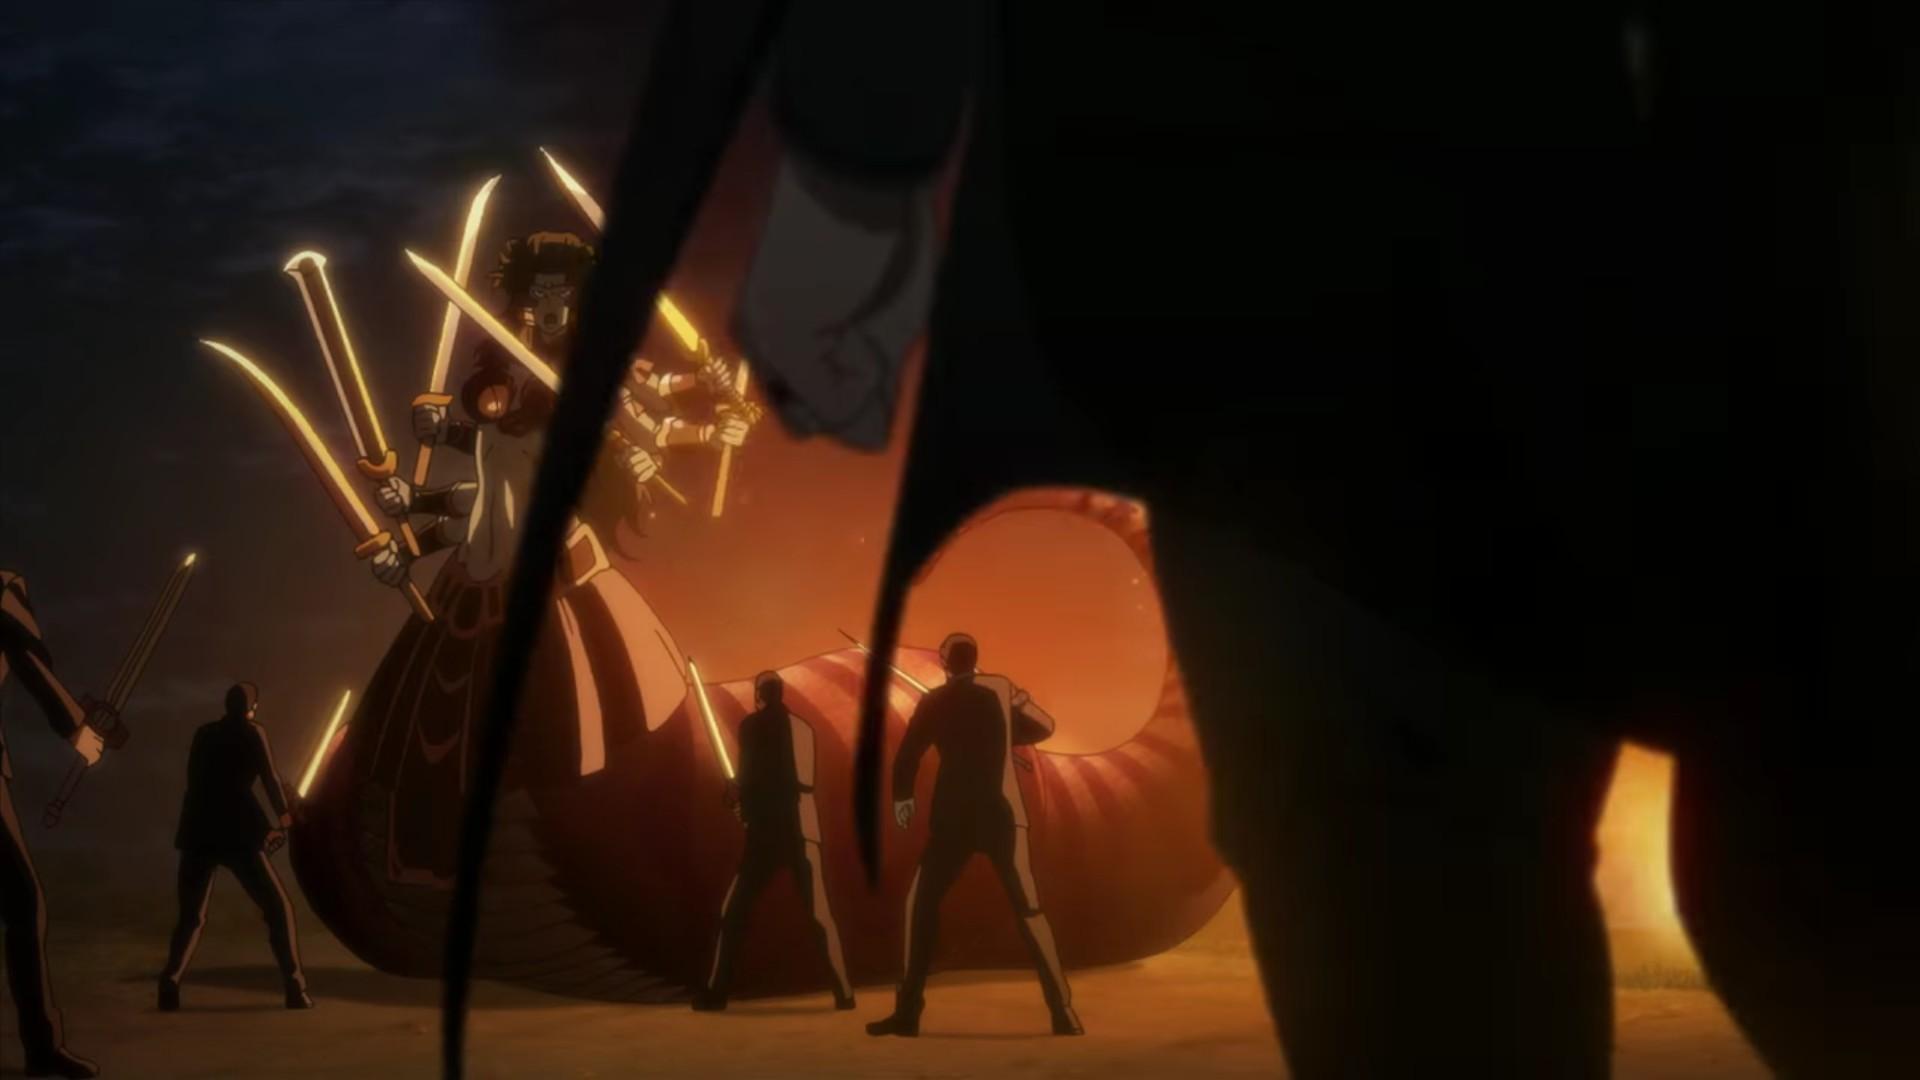 final-fantasy-xv-brotherhood-quinto-episodio-1-gamesoul Final Fantasy XV